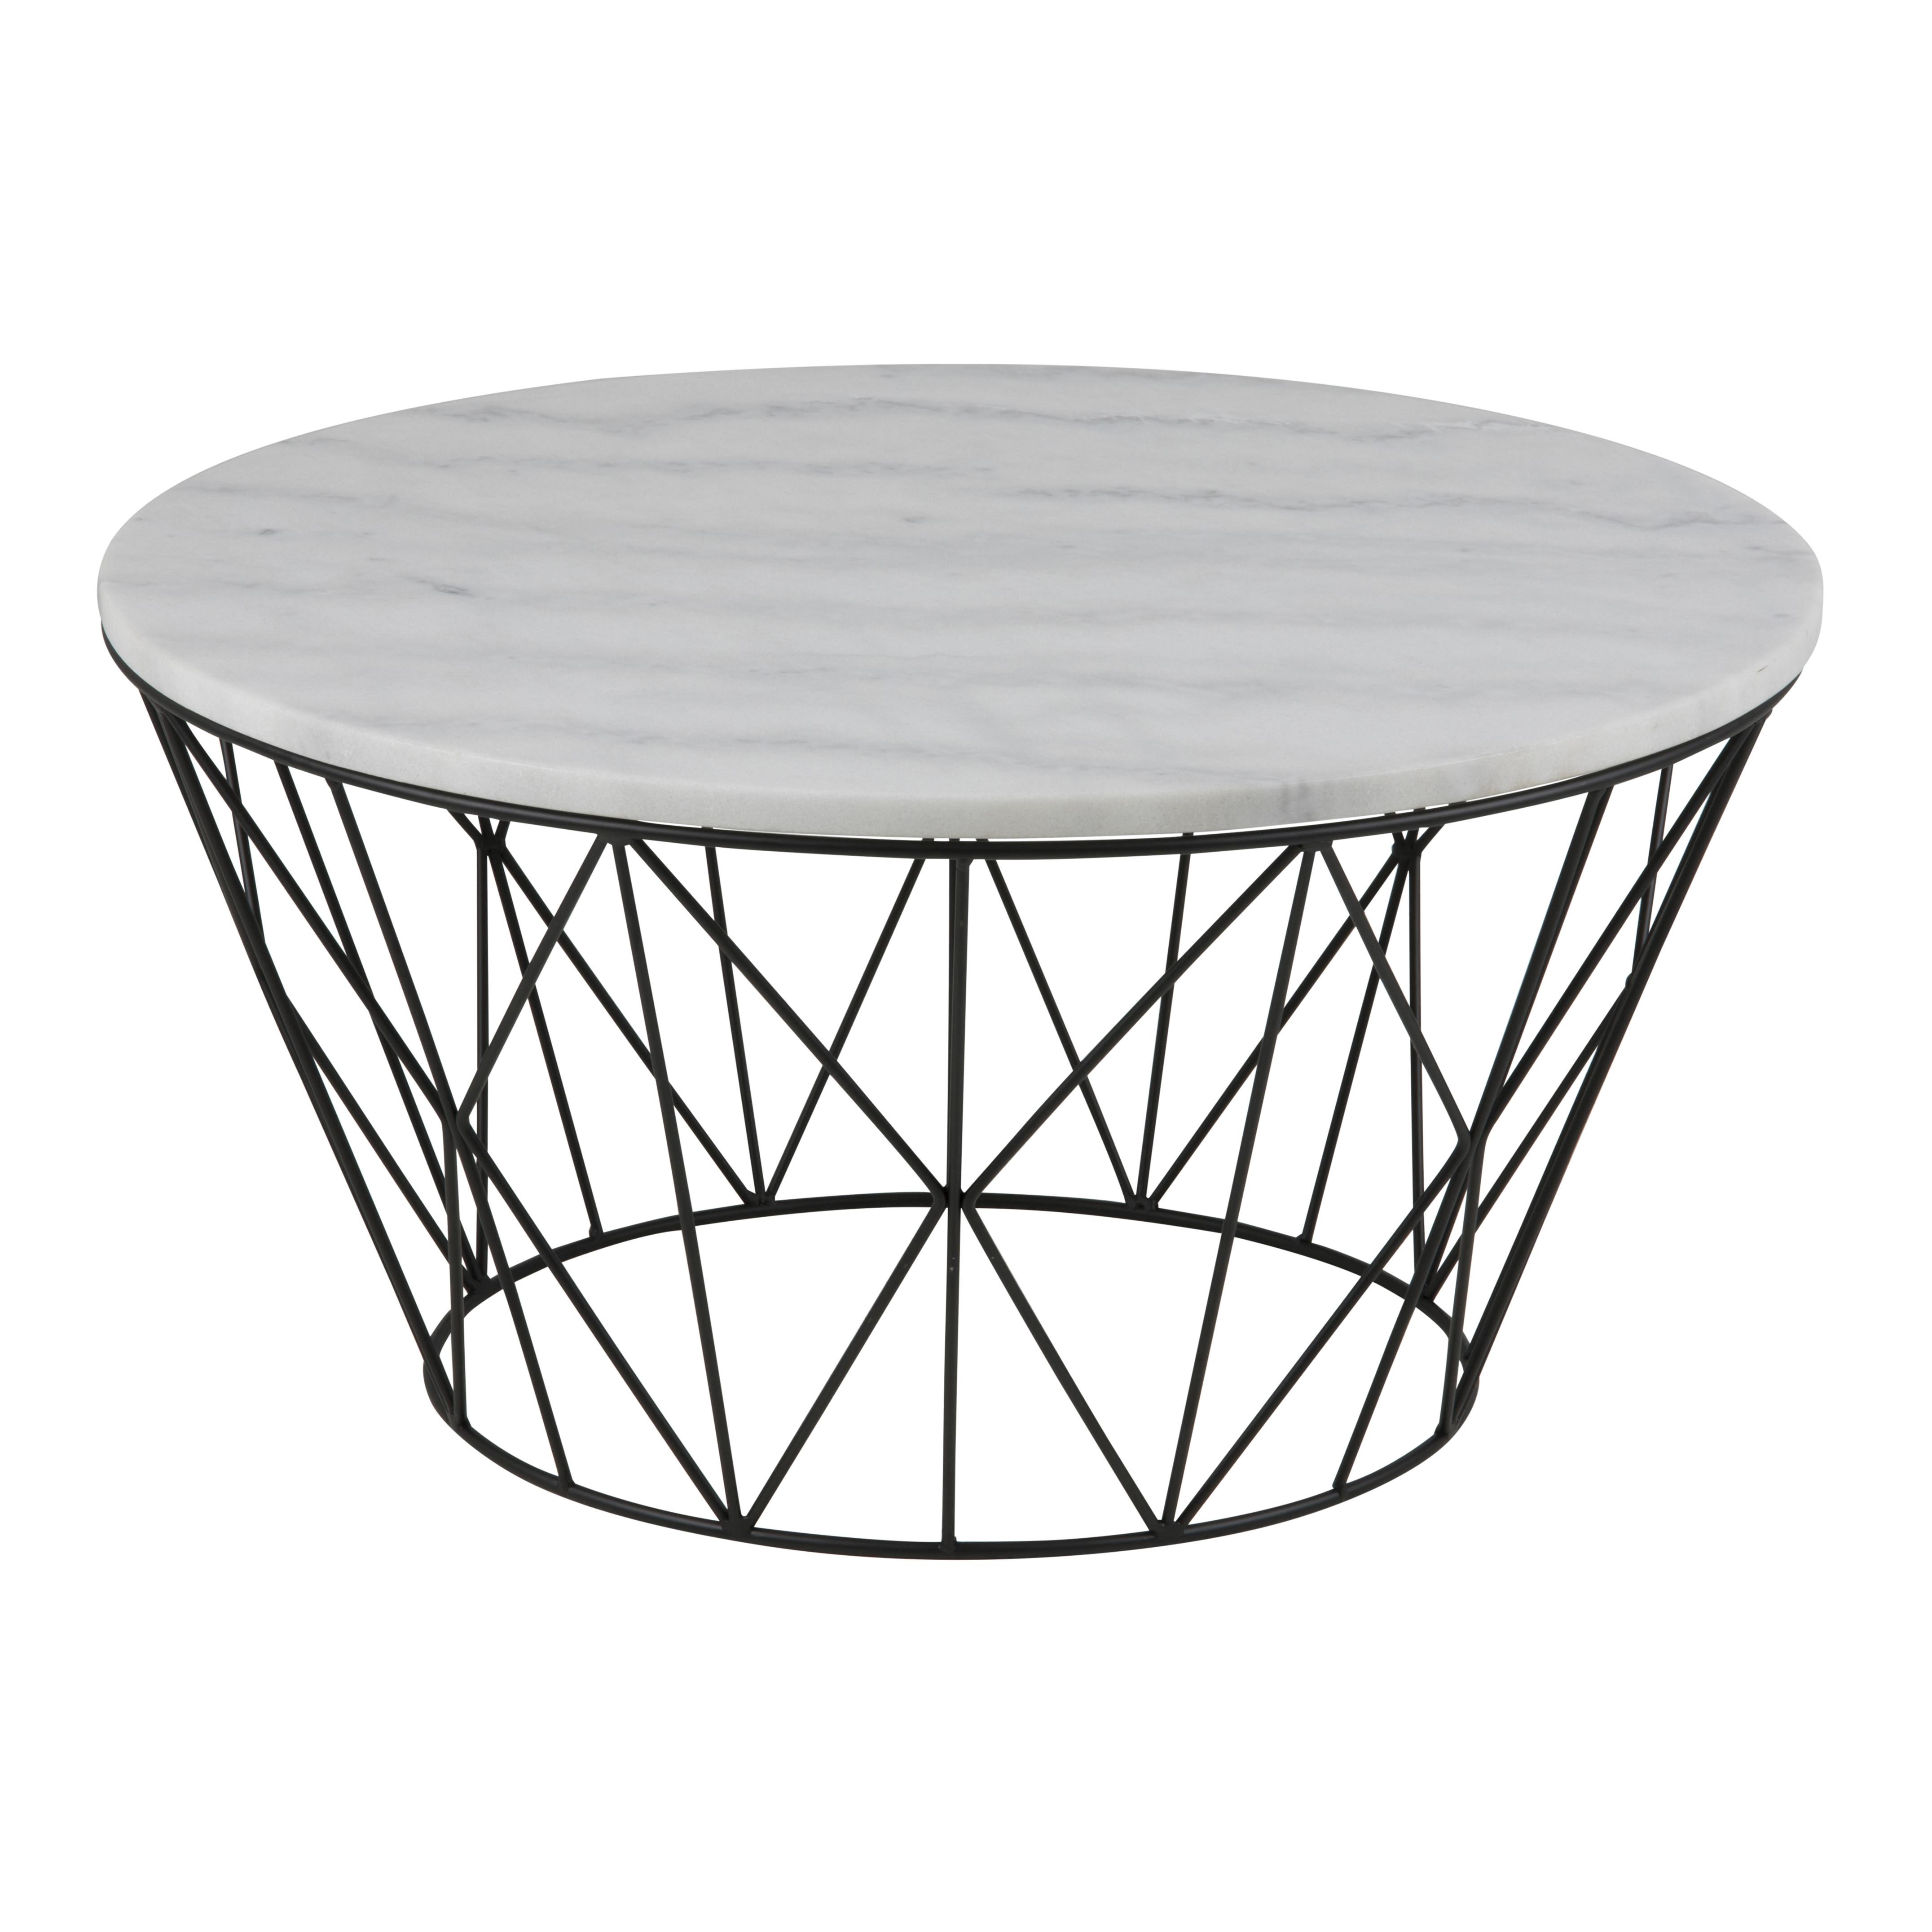 Coffee Table Derby Ø 80 | White Marble / Black